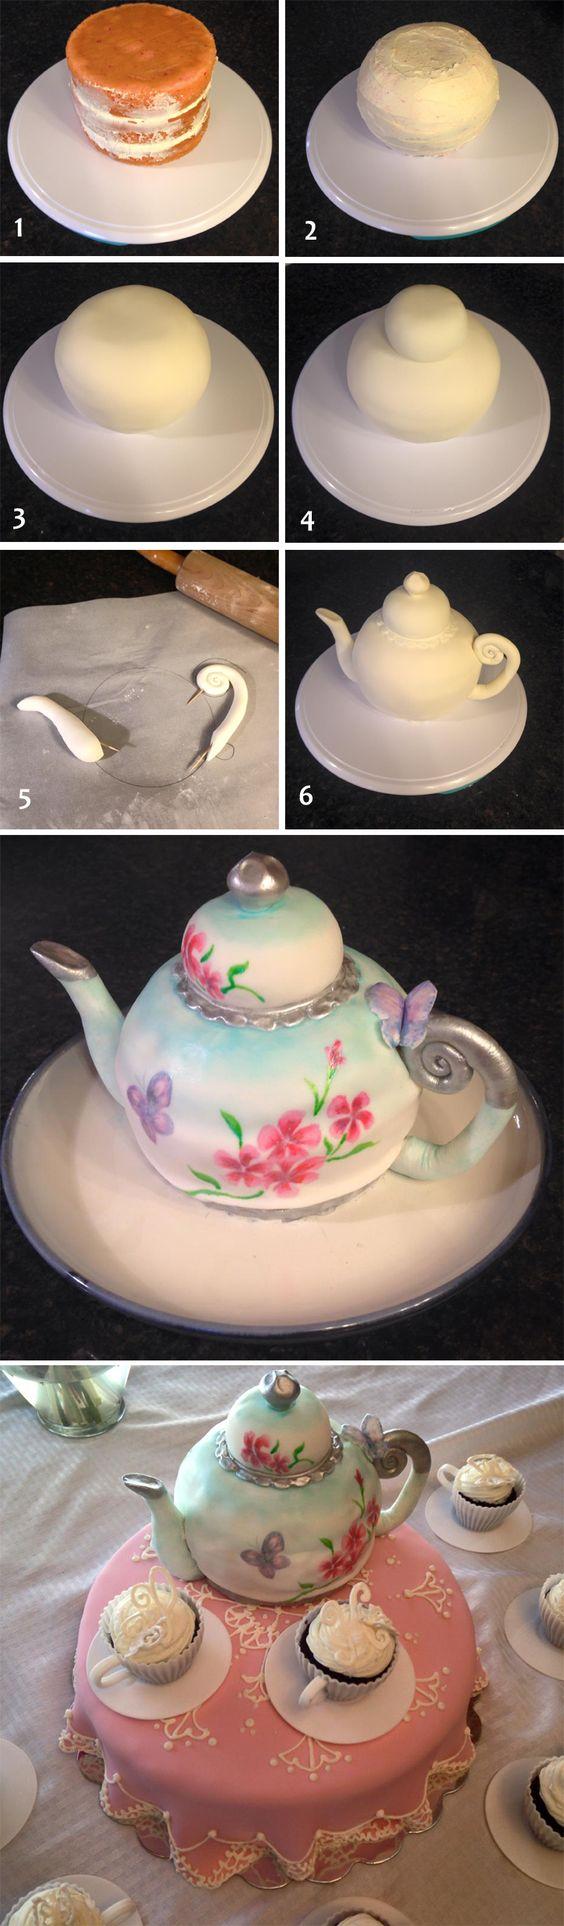 How To Make Teapot And Teacup Cake